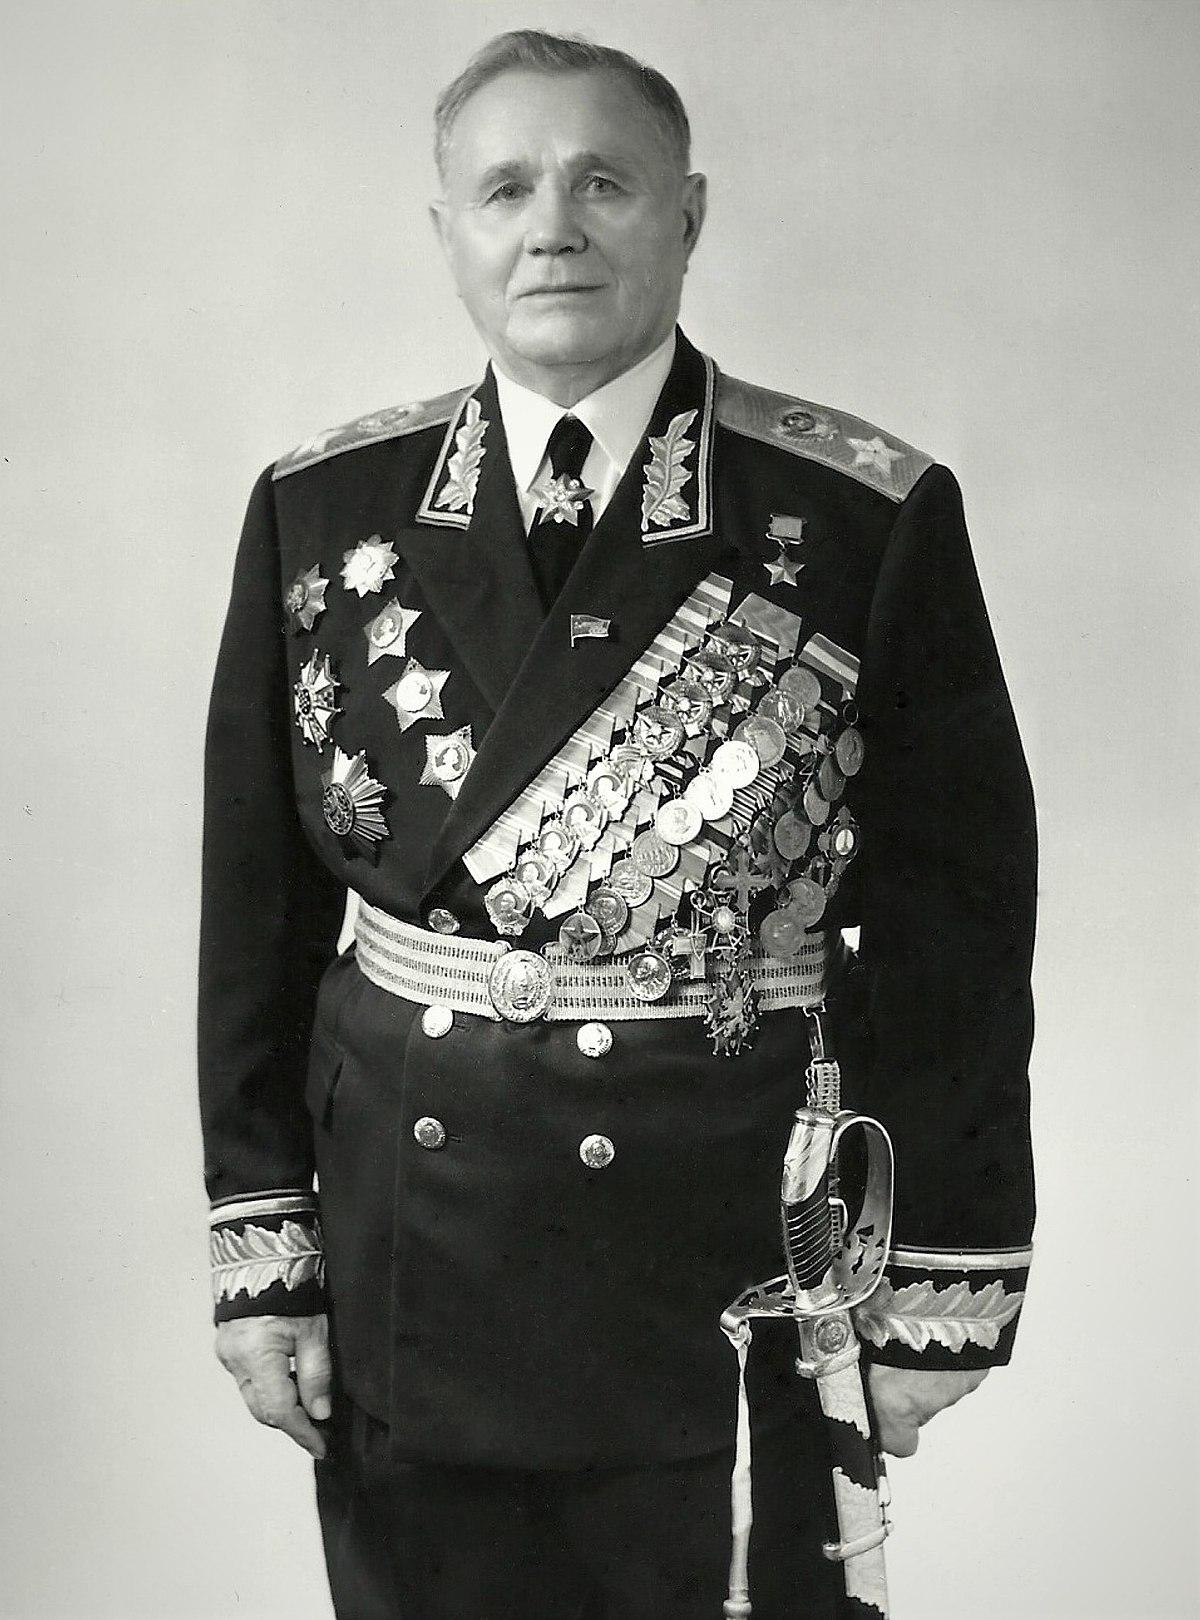 Маршал Советского Союза Герой Советского Союза Андрей Иванович Ерёменко